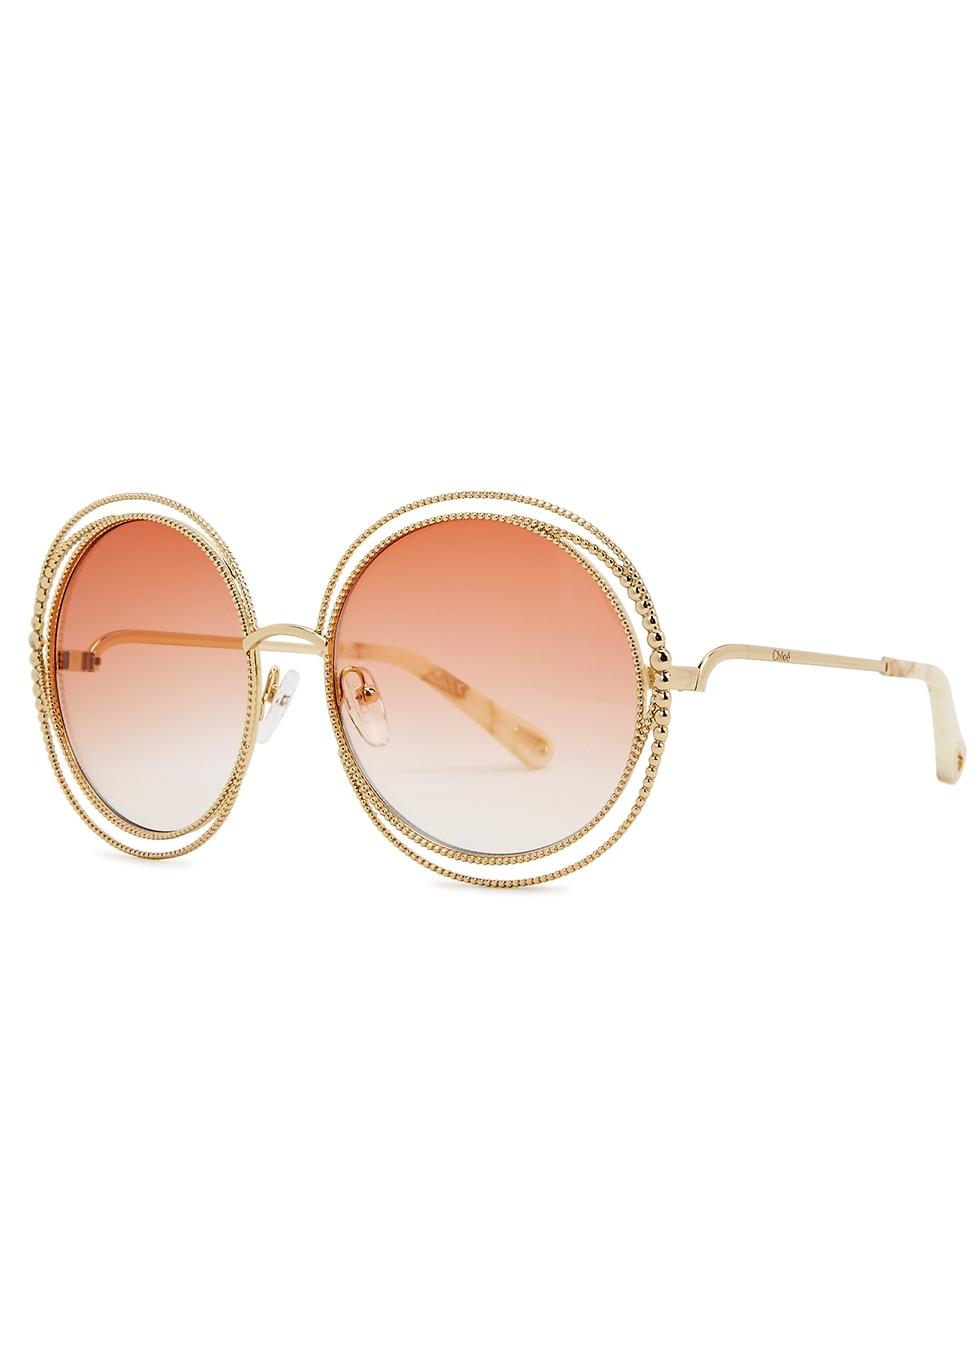 9e71edf27c2 Chloé Tortoiseshell hexagonal-frame sunglasses - Harvey Nichols